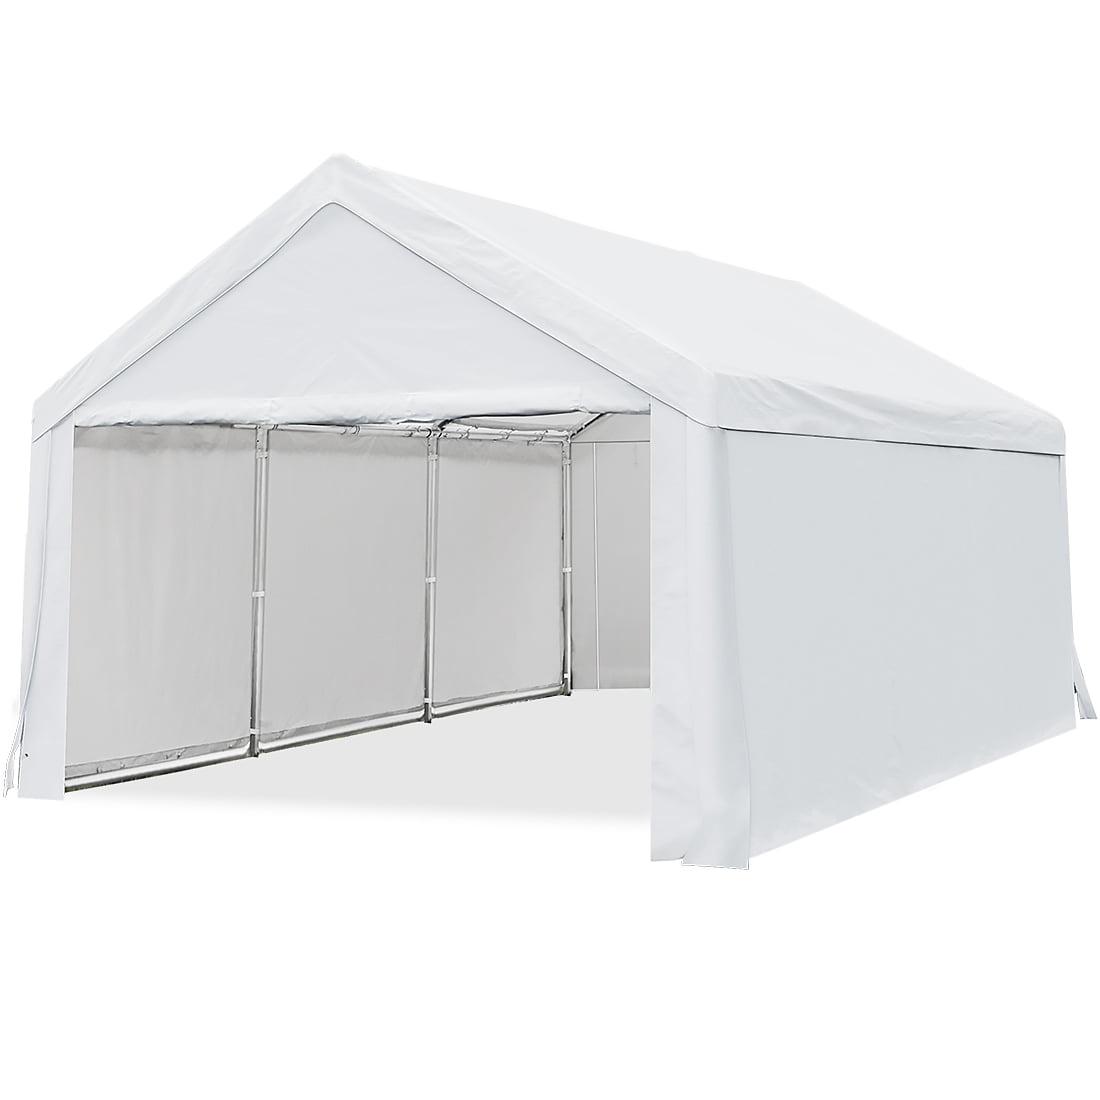 20 x Galvanised Metal Tent Pegs For Camping Gazebo Ground Sheet